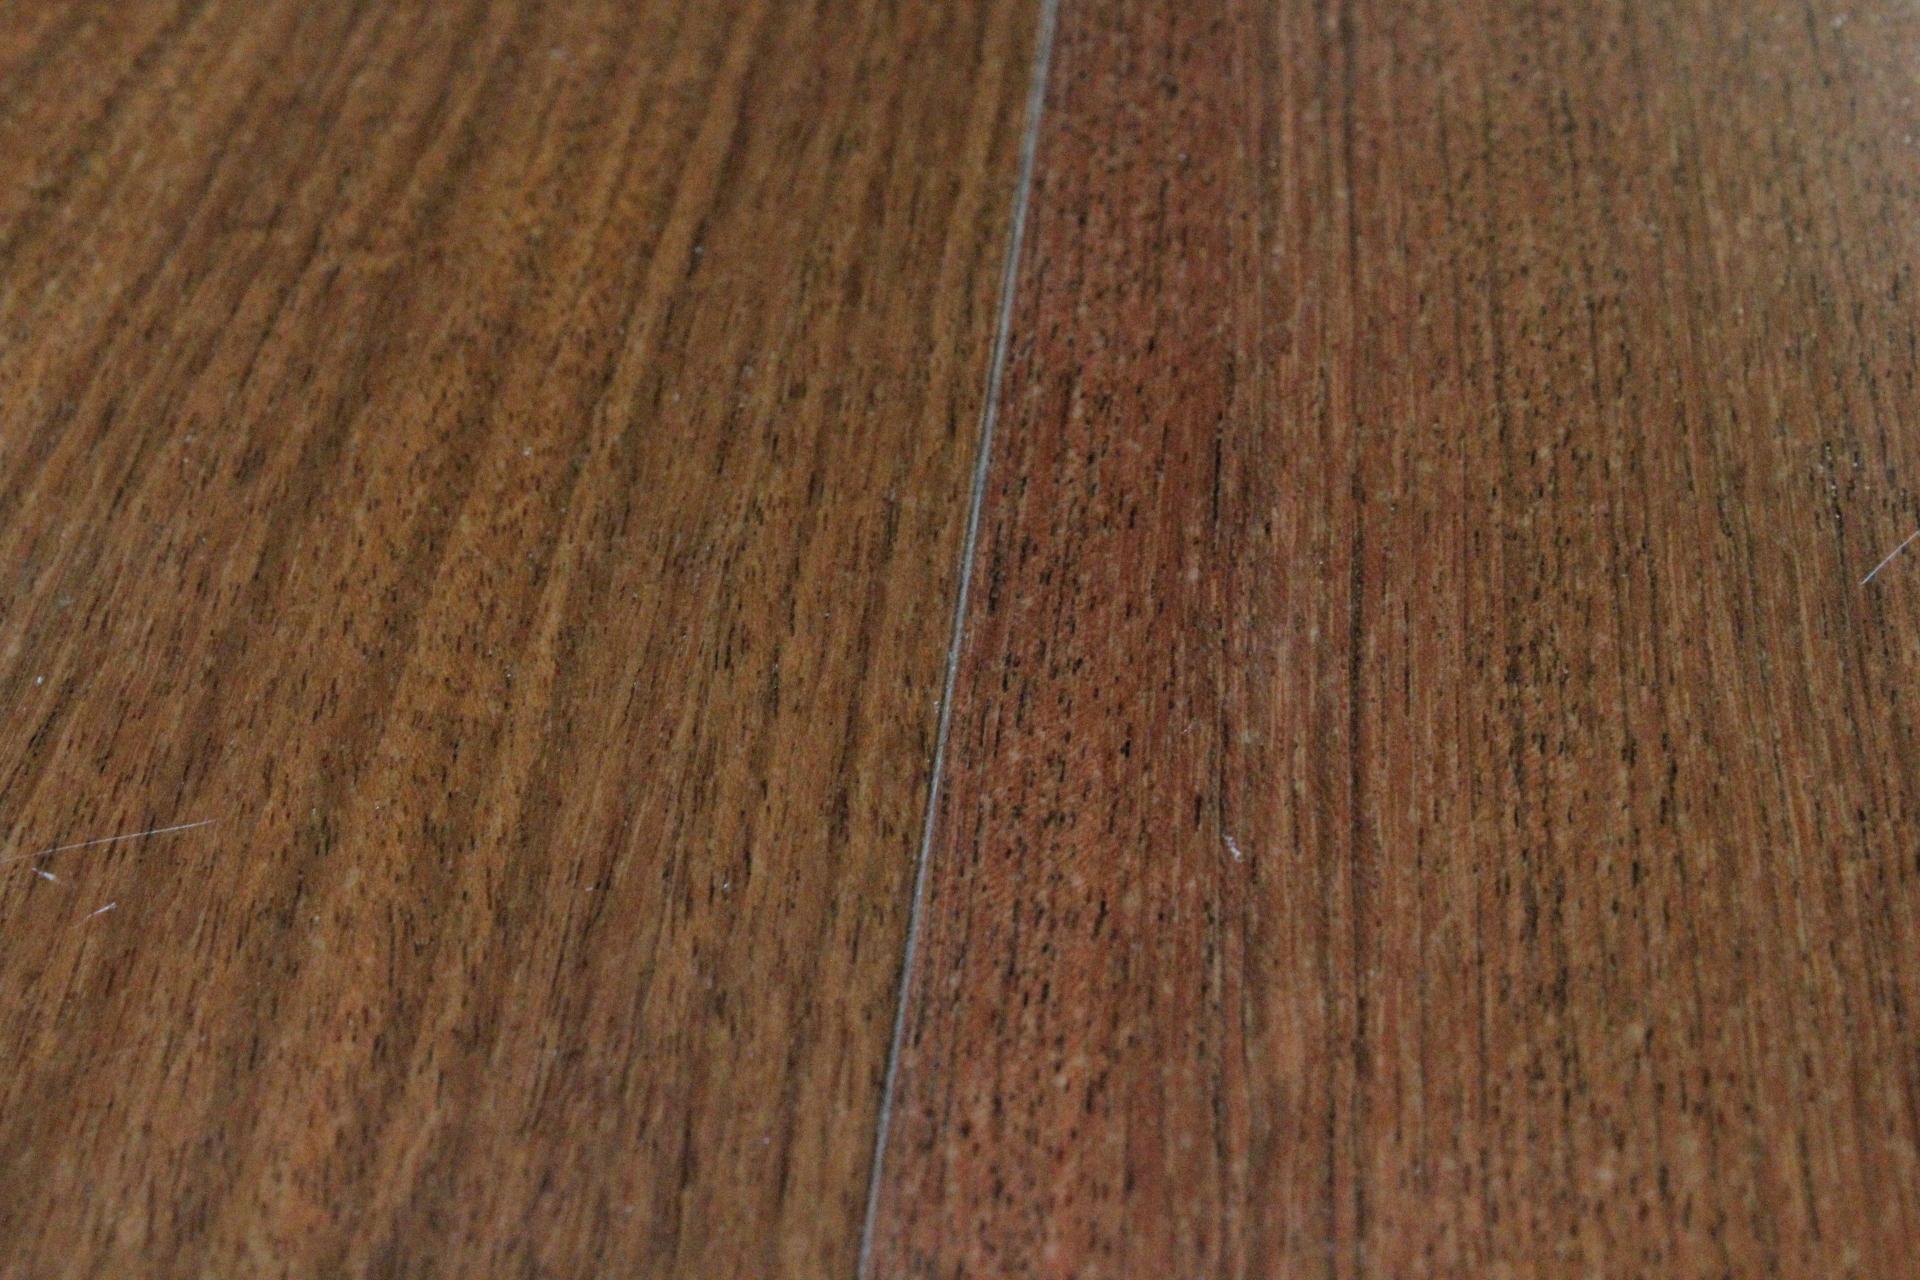 Hardwood, prefinished floor, engineered wood, solid wood, lifestyle, hard surface, prefinished hardwood, prefinished wood, home, design, interior design, wood floor design, mirage